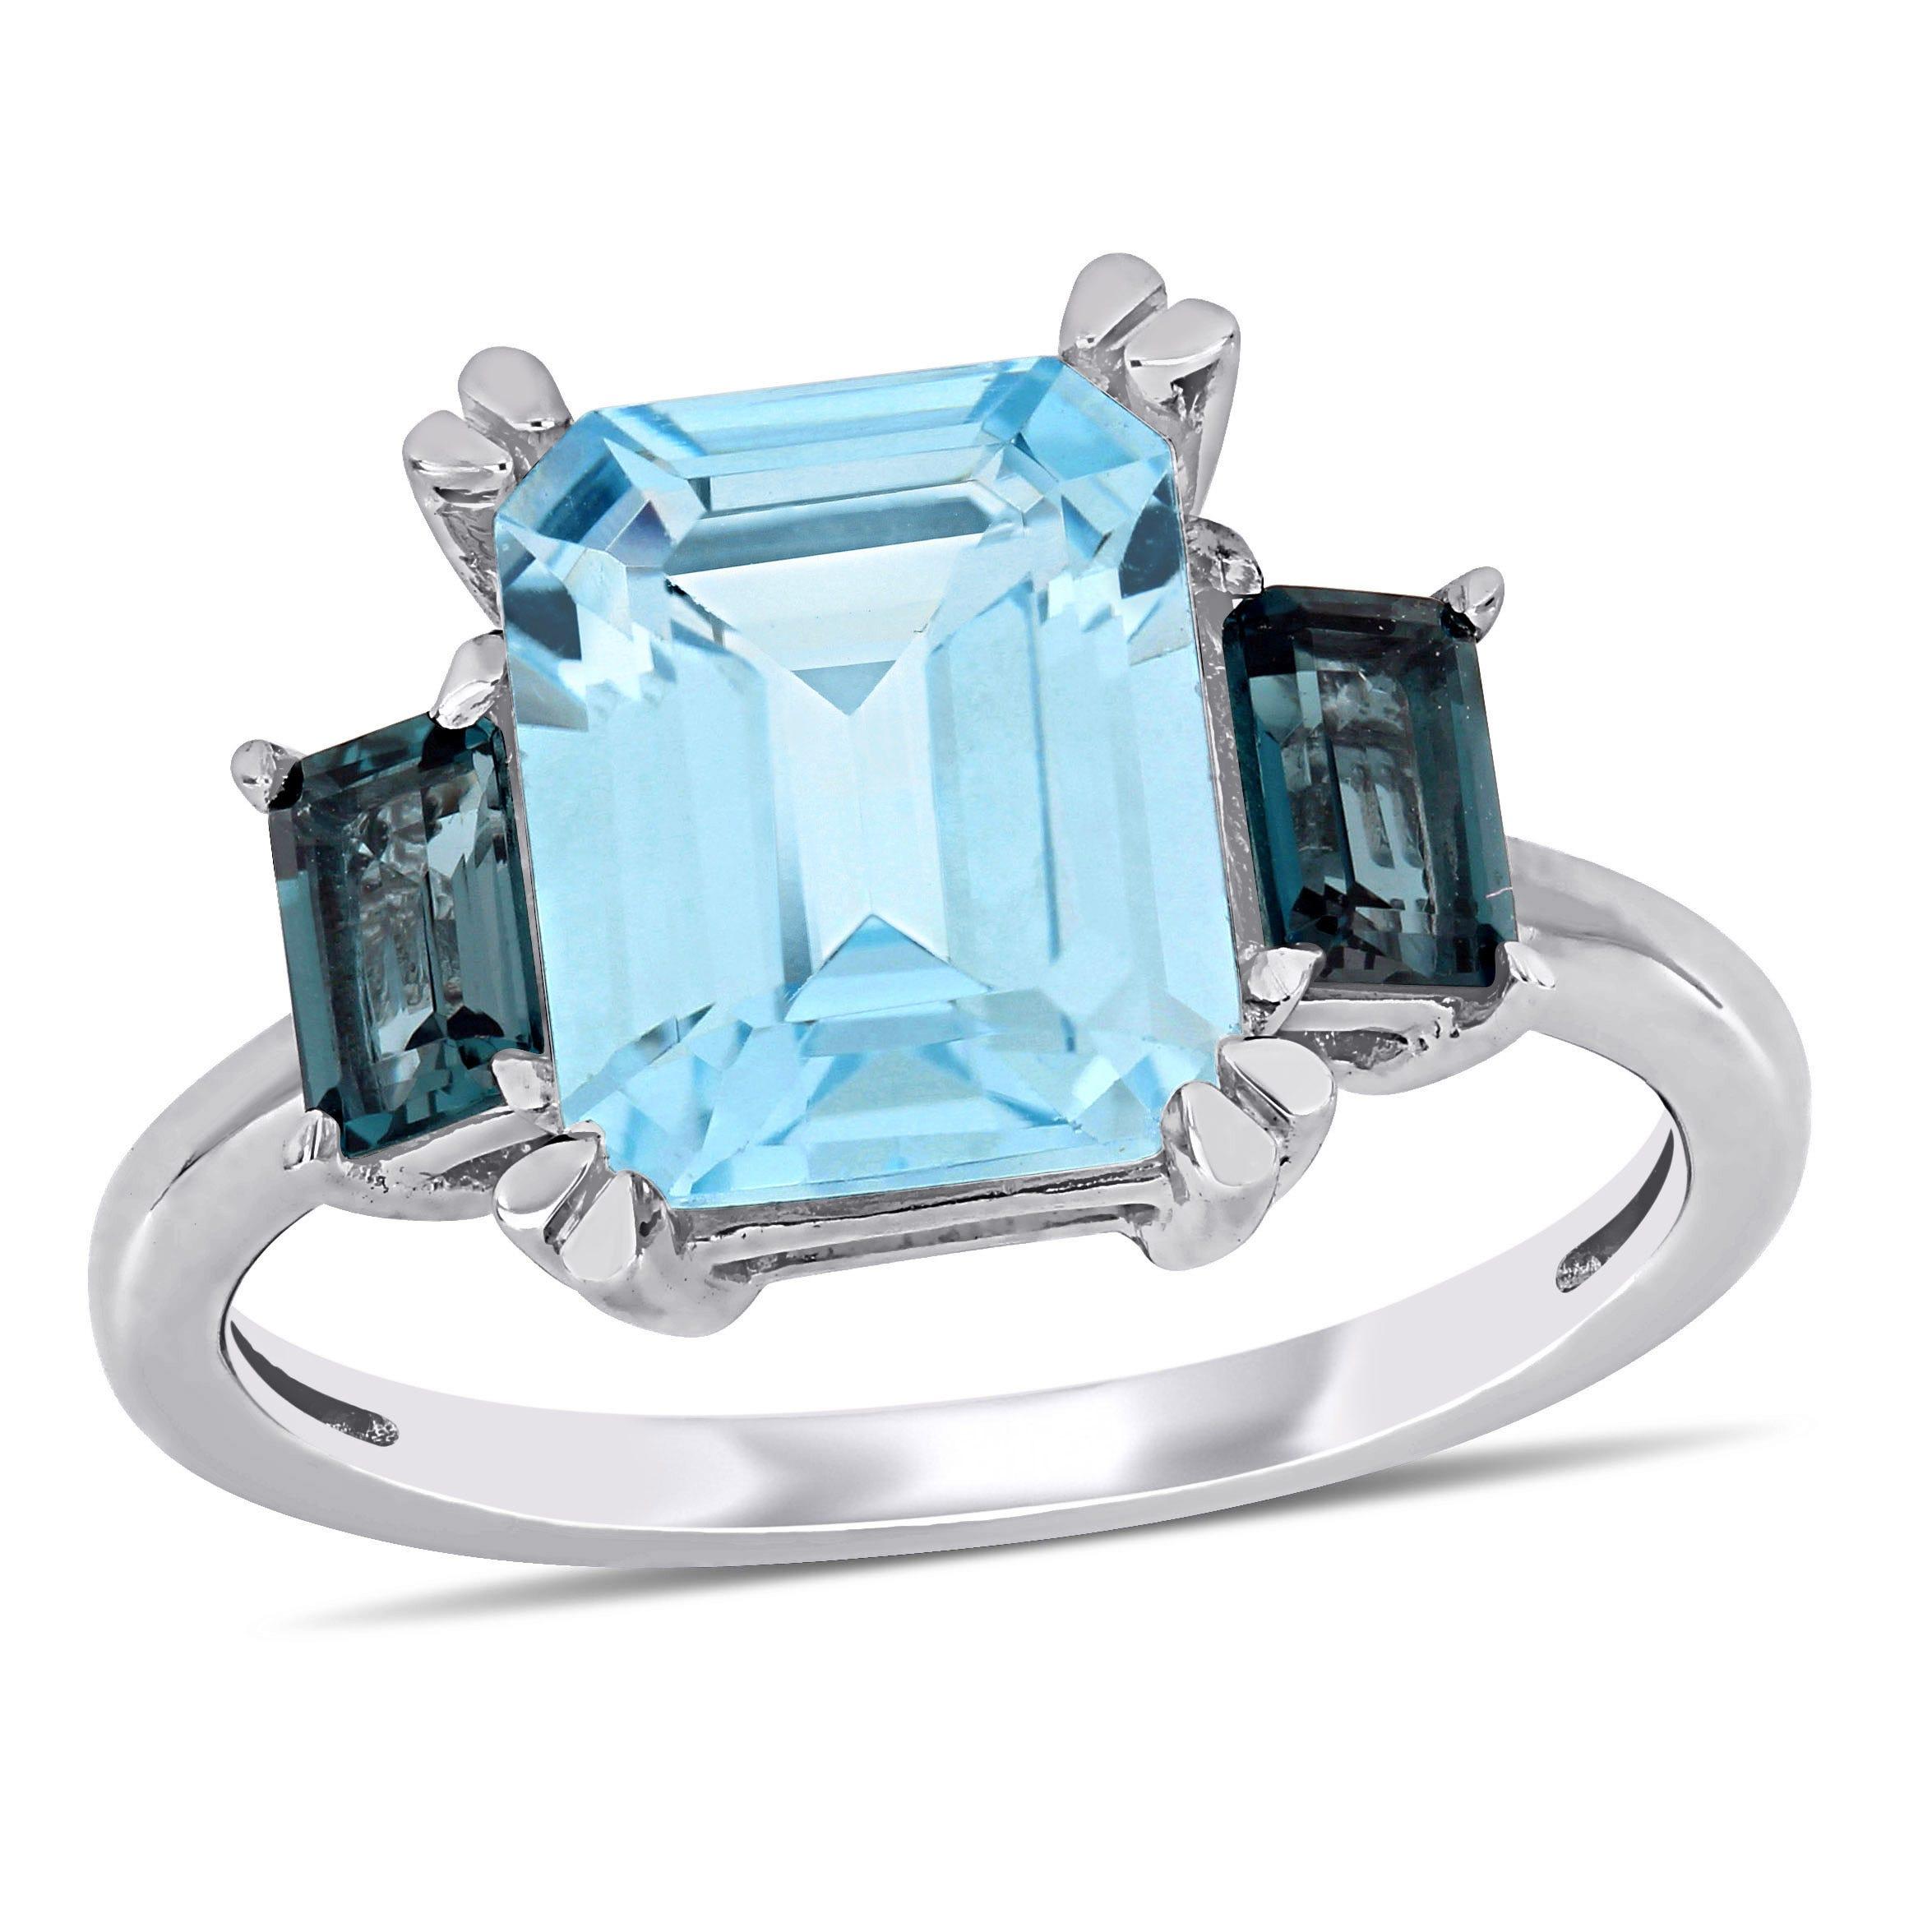 Sky Blue Topaz and London Blue Topaz Ring in 14k White Gold